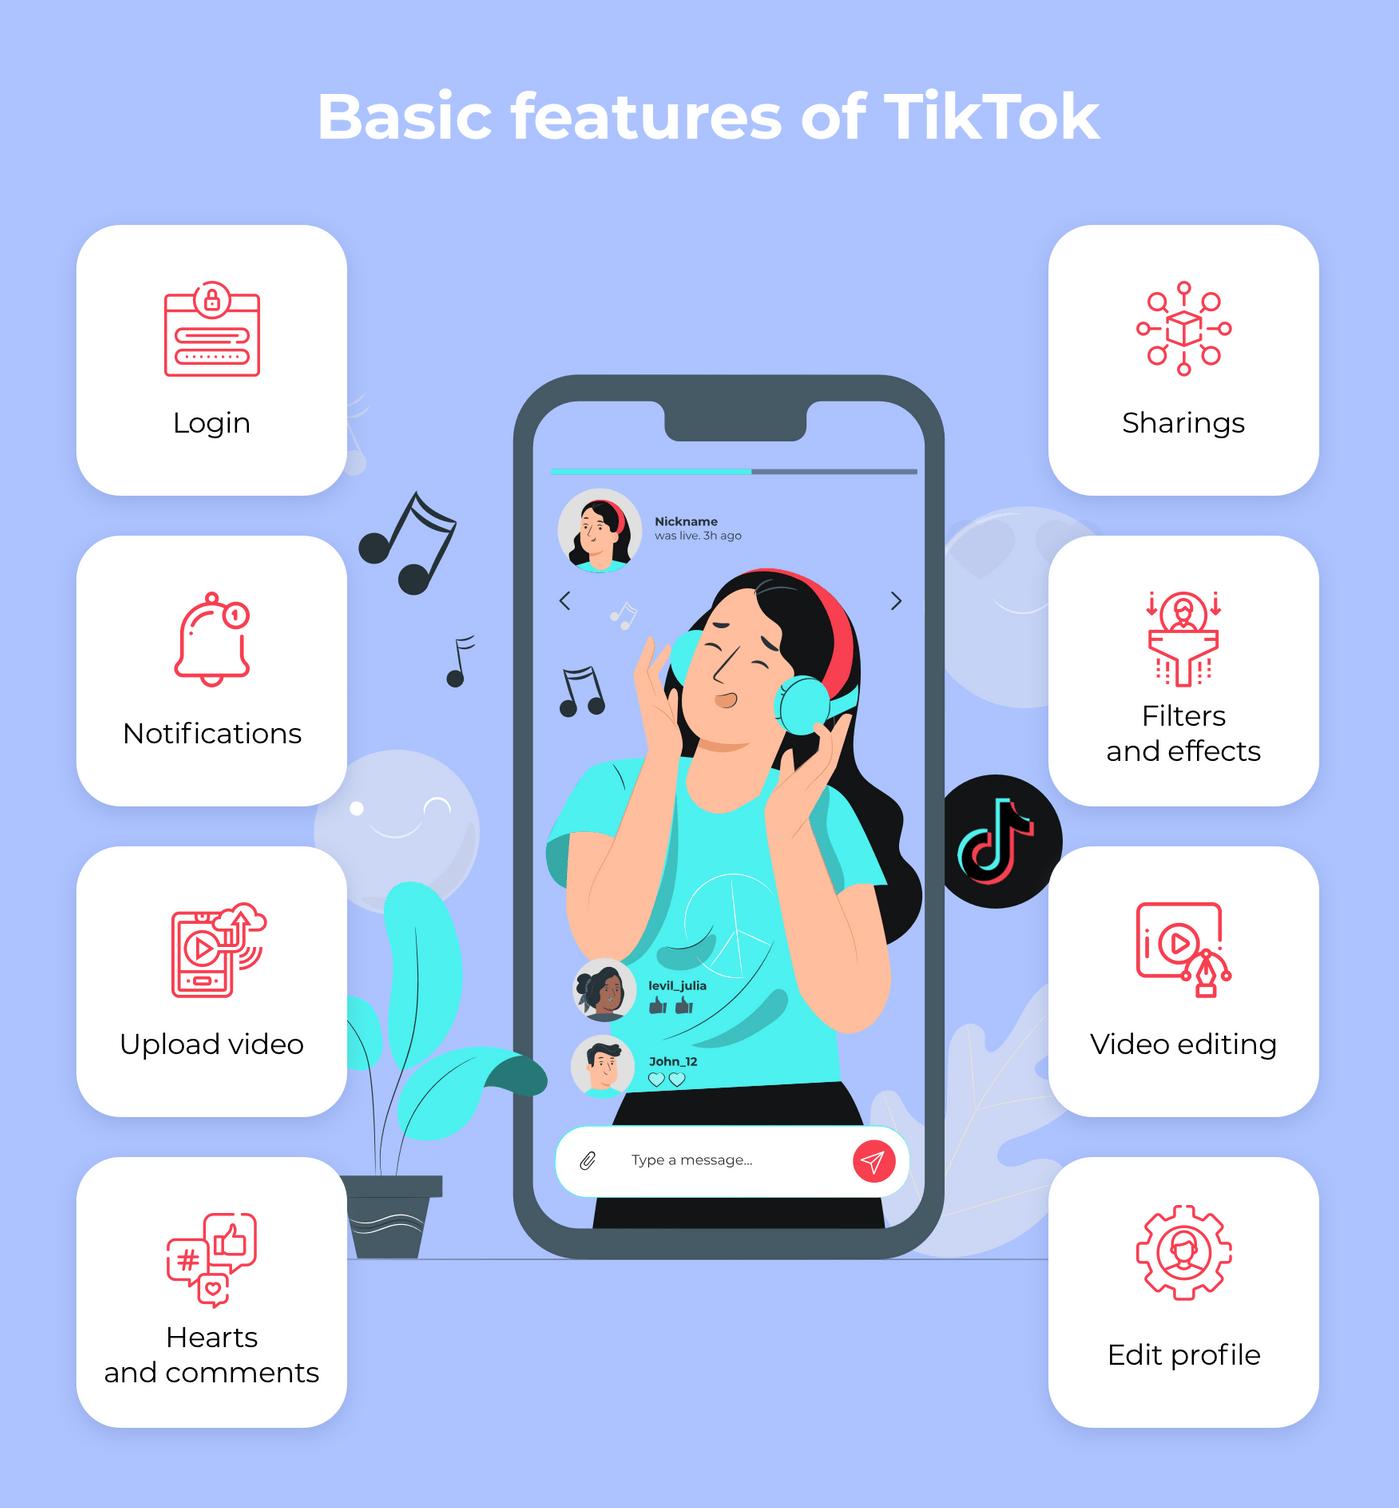 Basic features of an app like TikTok